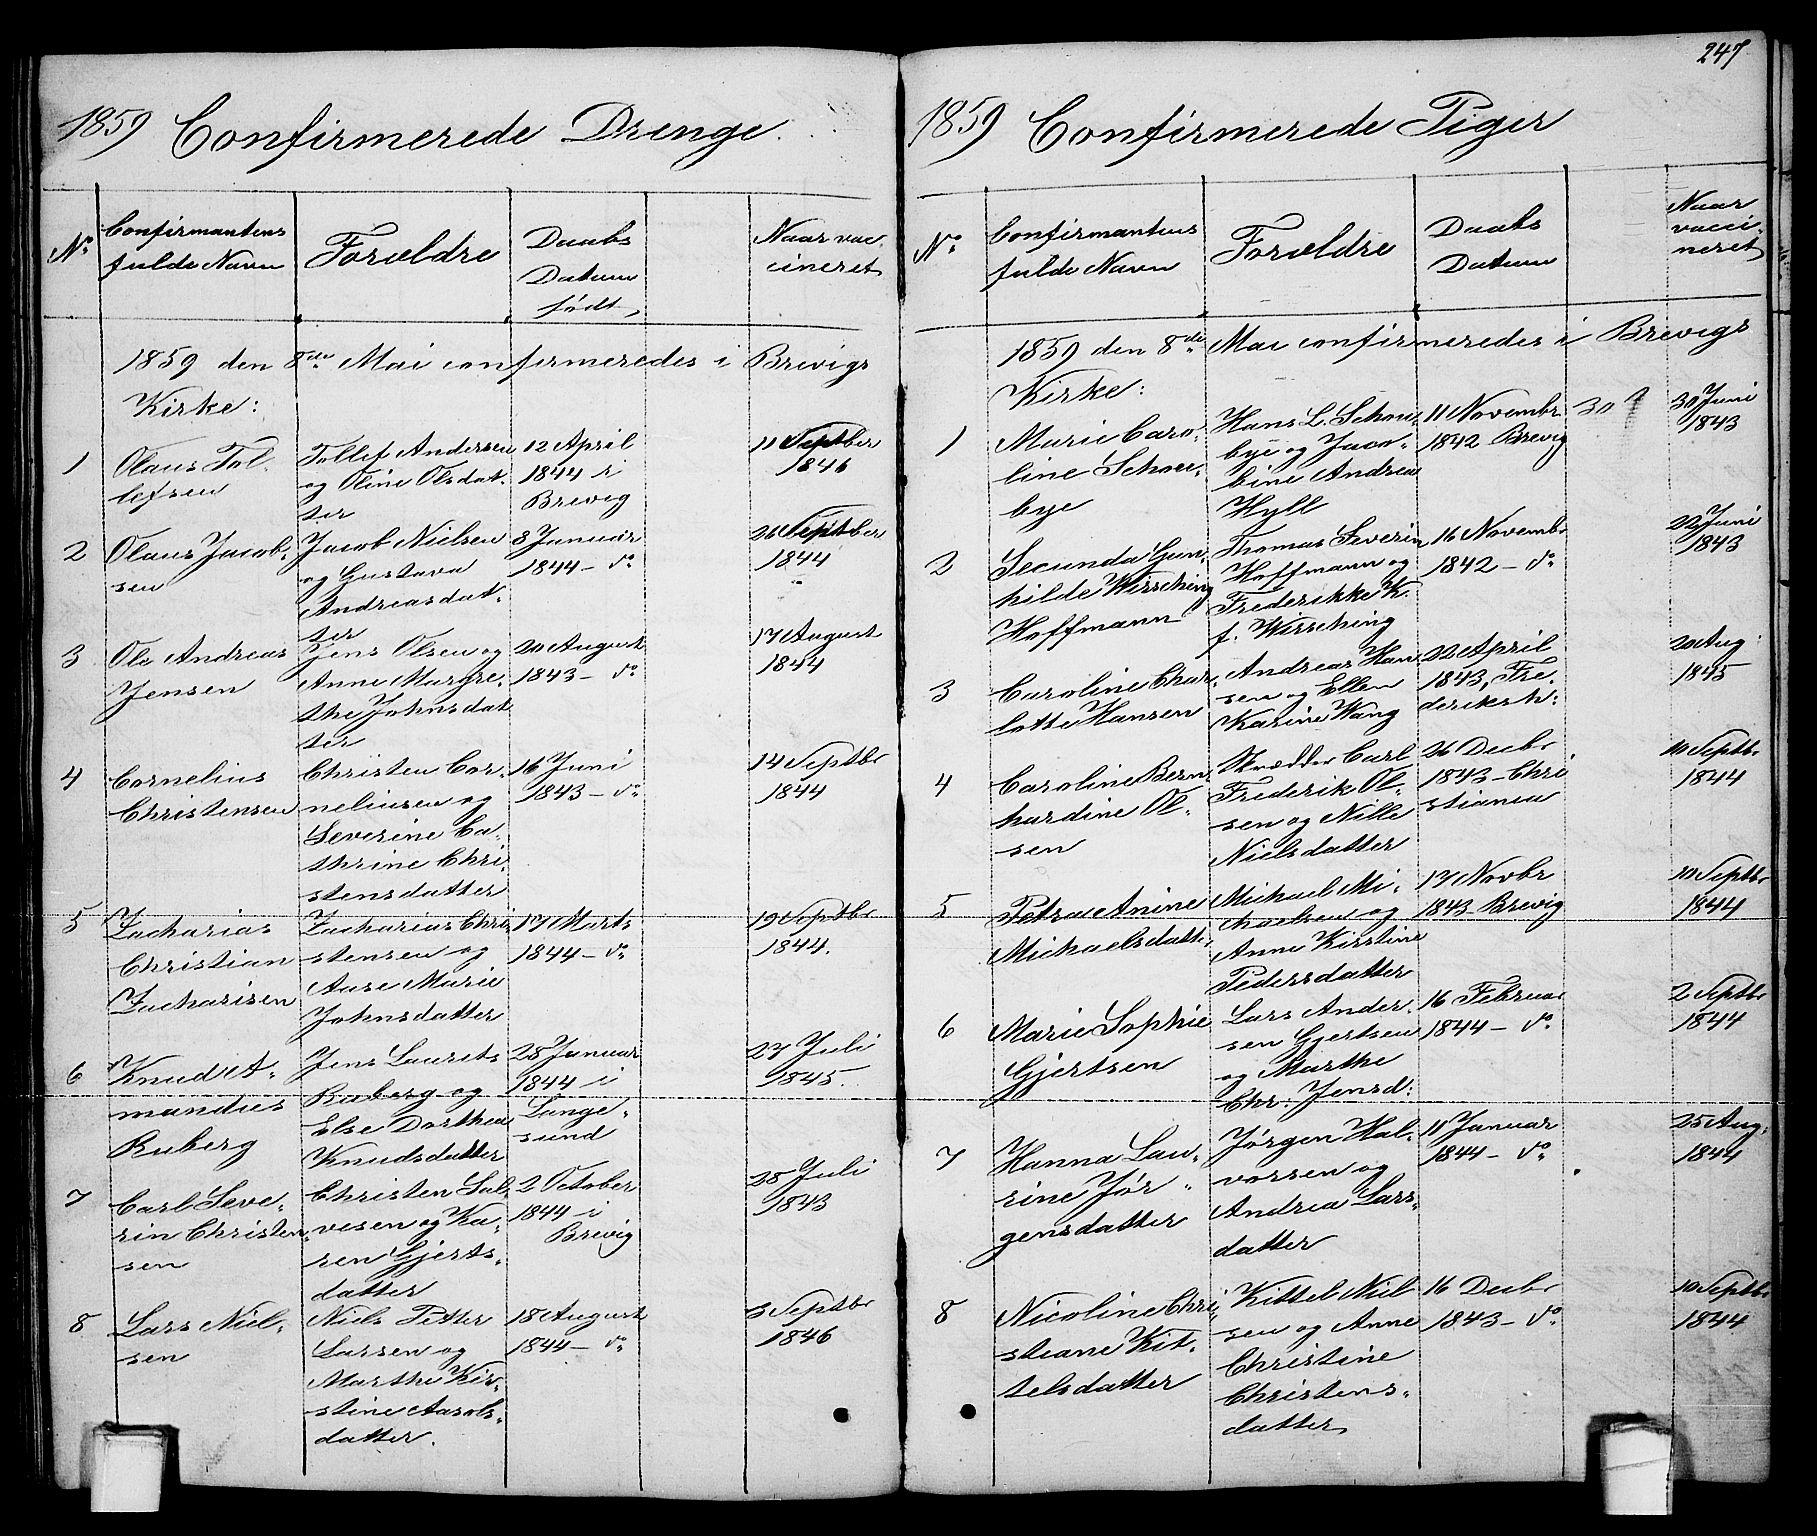 SAKO, Brevik kirkebøker, G/Ga/L0002: Klokkerbok nr. 2, 1846-1865, s. 247